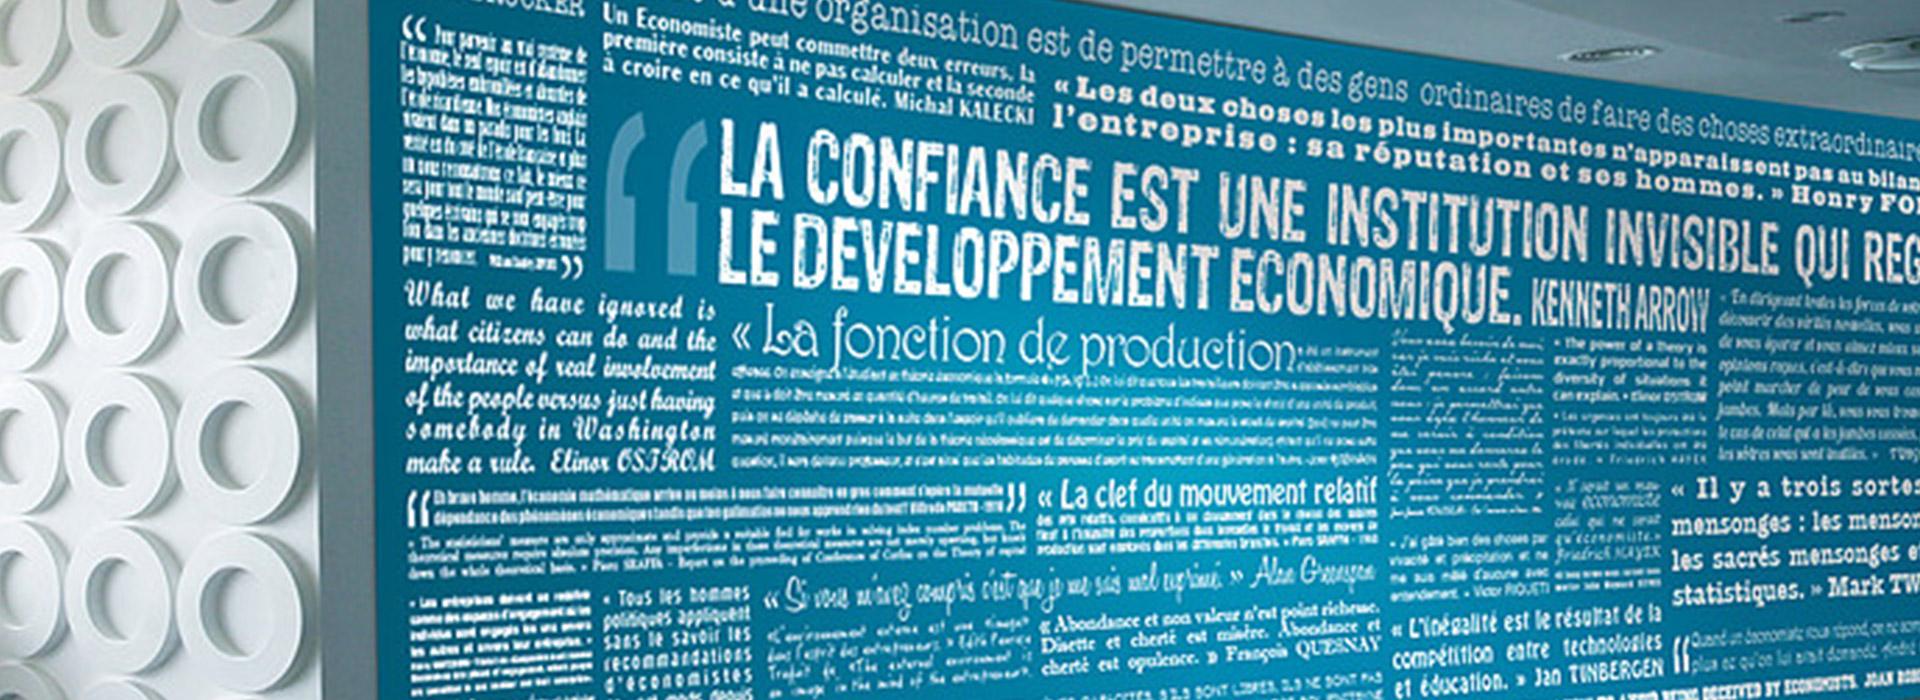 http://adsolue-mur-citations-isem-web-paysage